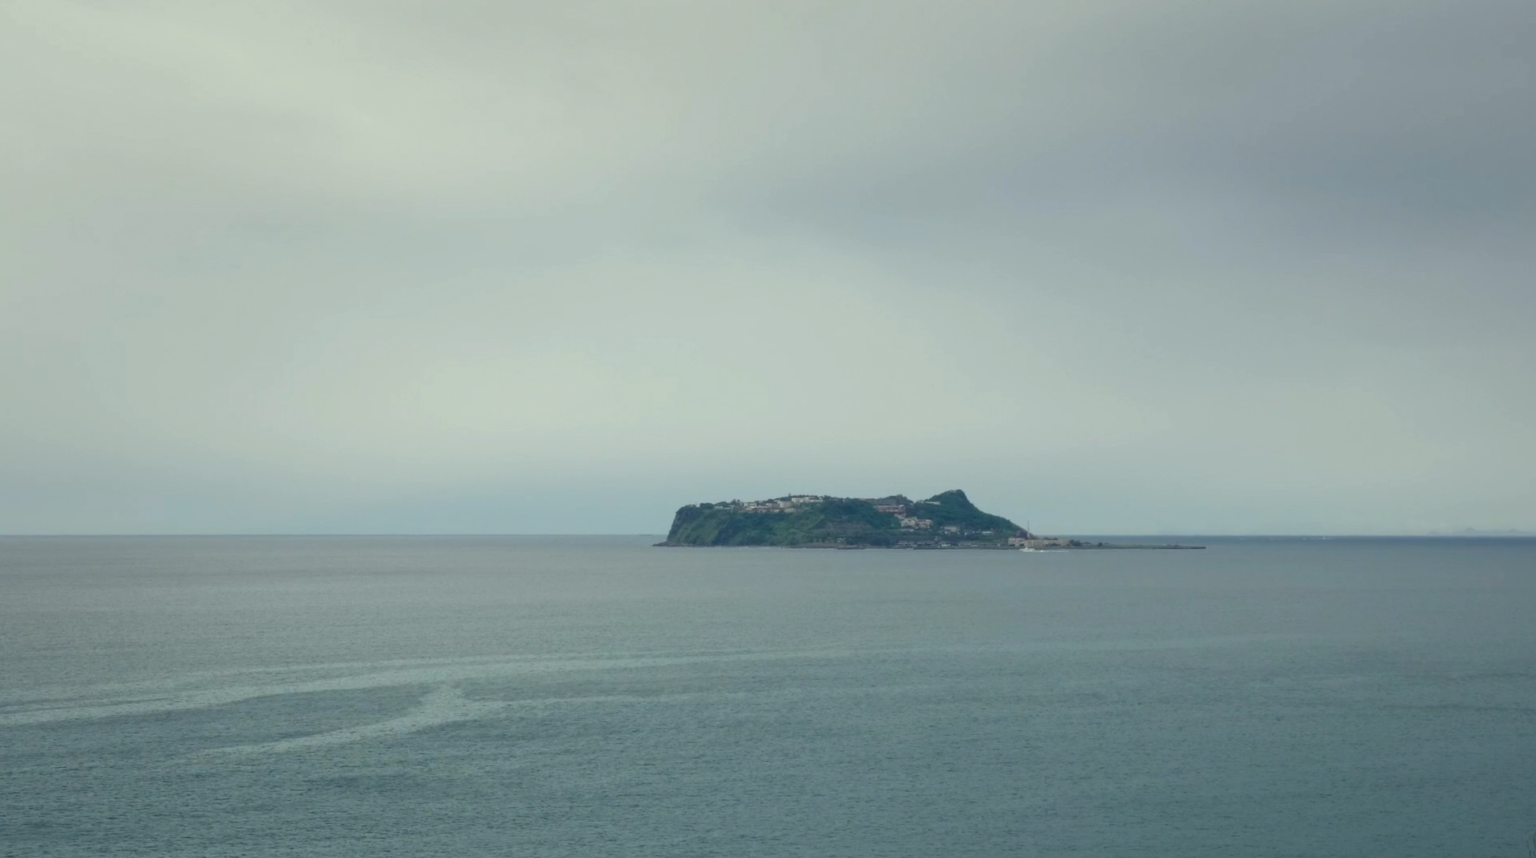 Dreaming An Island by Andrea Pellerani